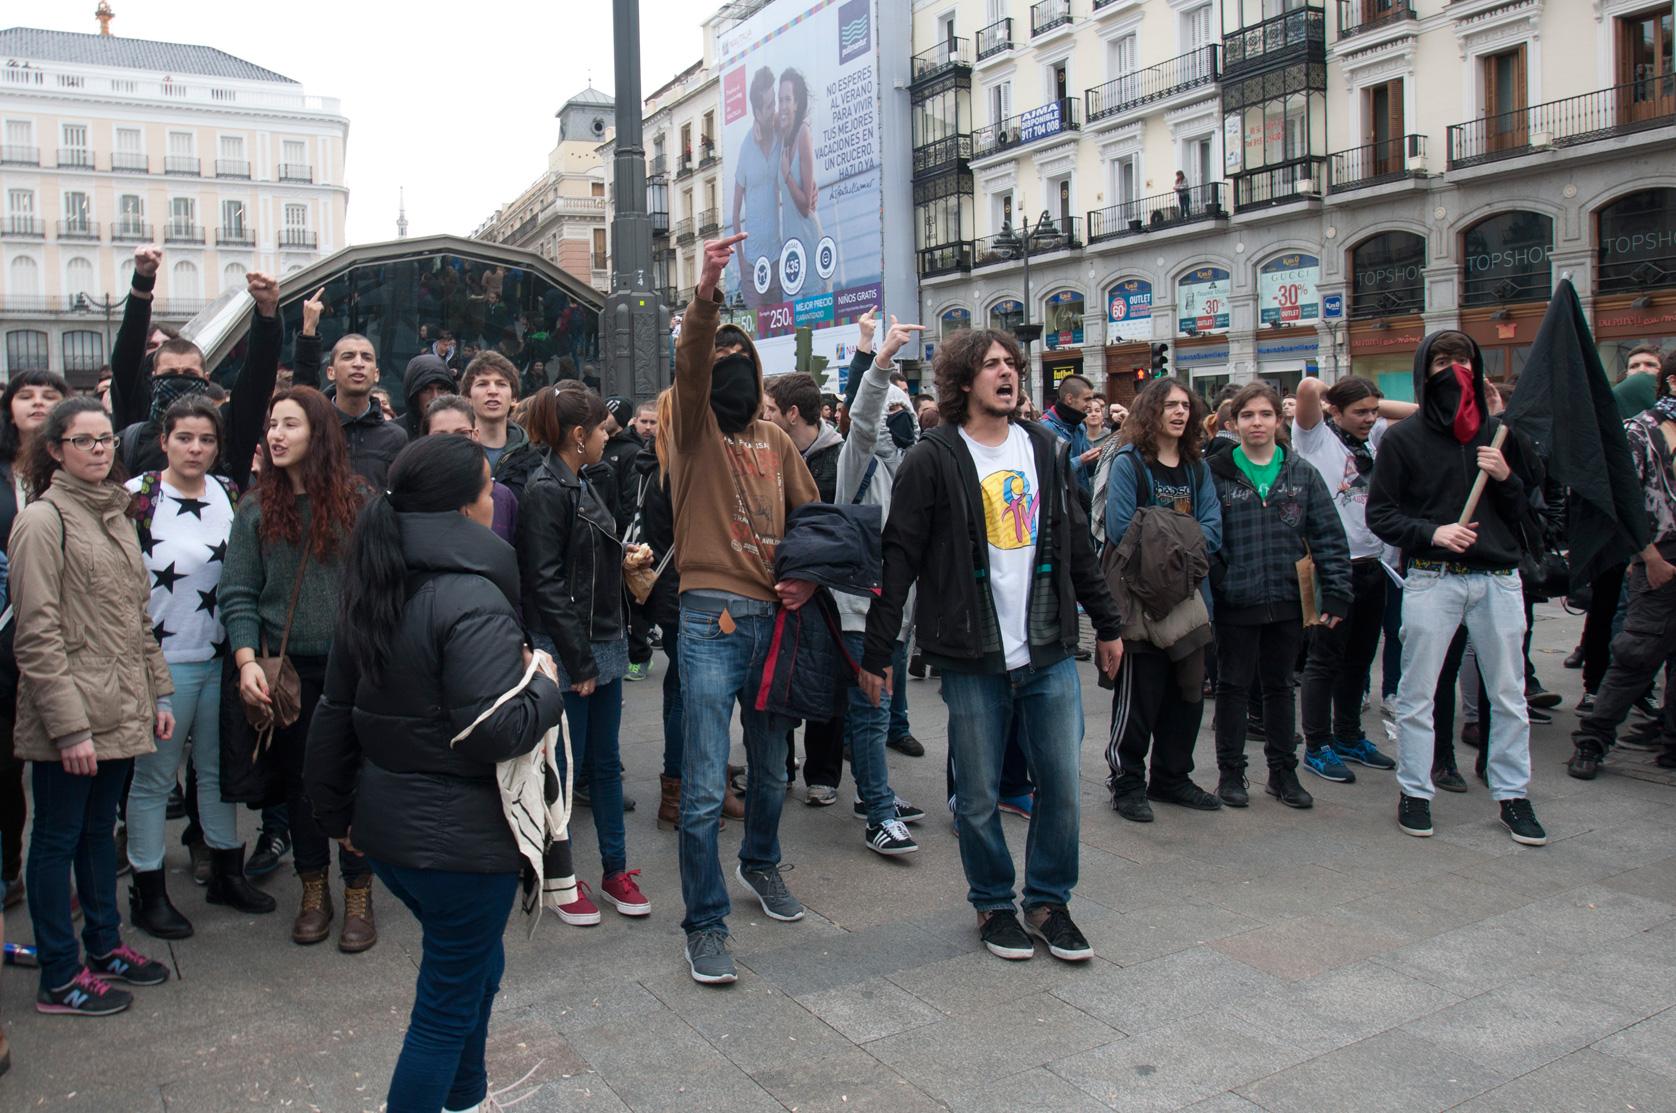 Manifestación de estudiantes en Madrid. ©DAVID ALONSO RINCÓN